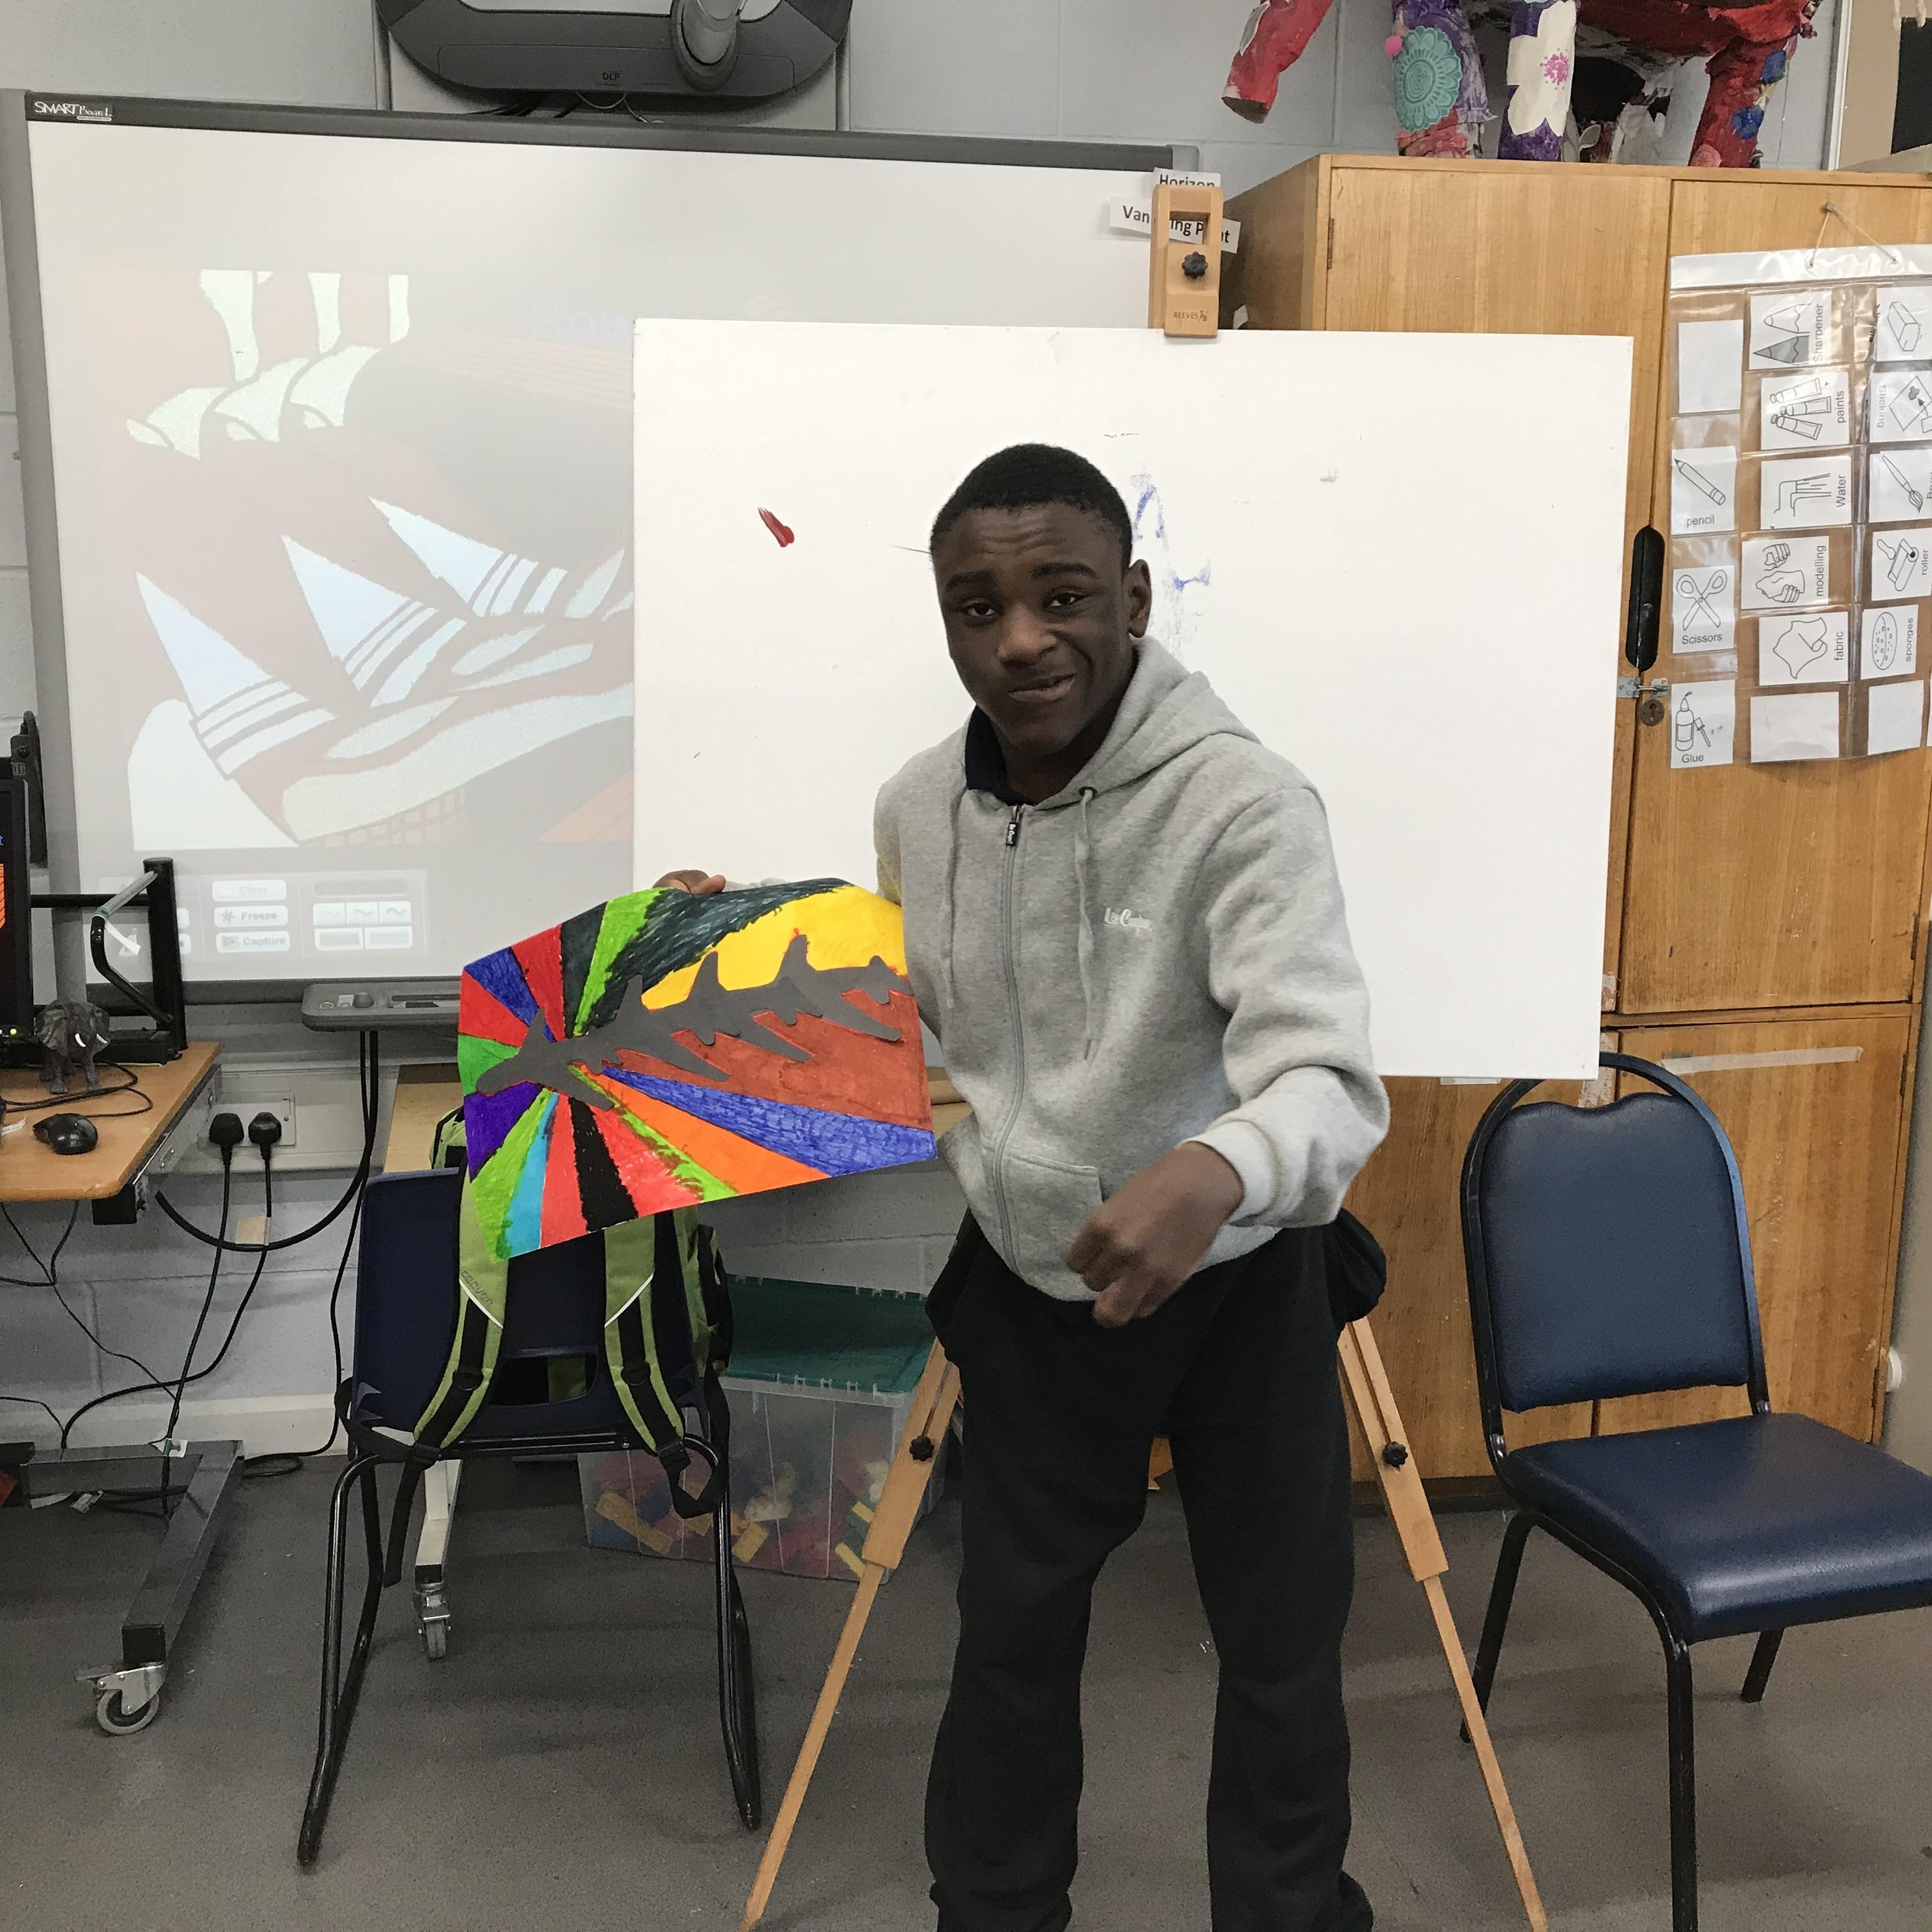 Student holding artwork up